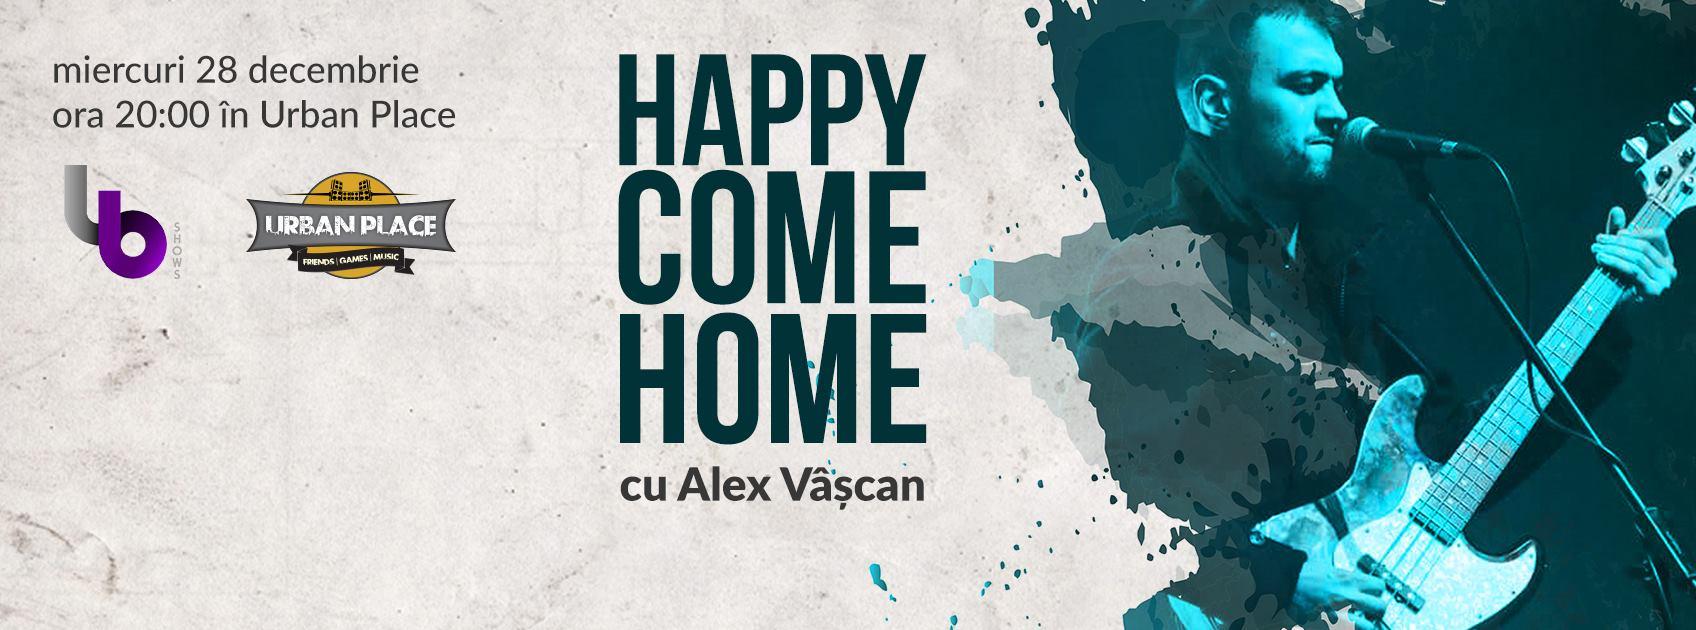 Happy Come Home cu Alex Vâşcan